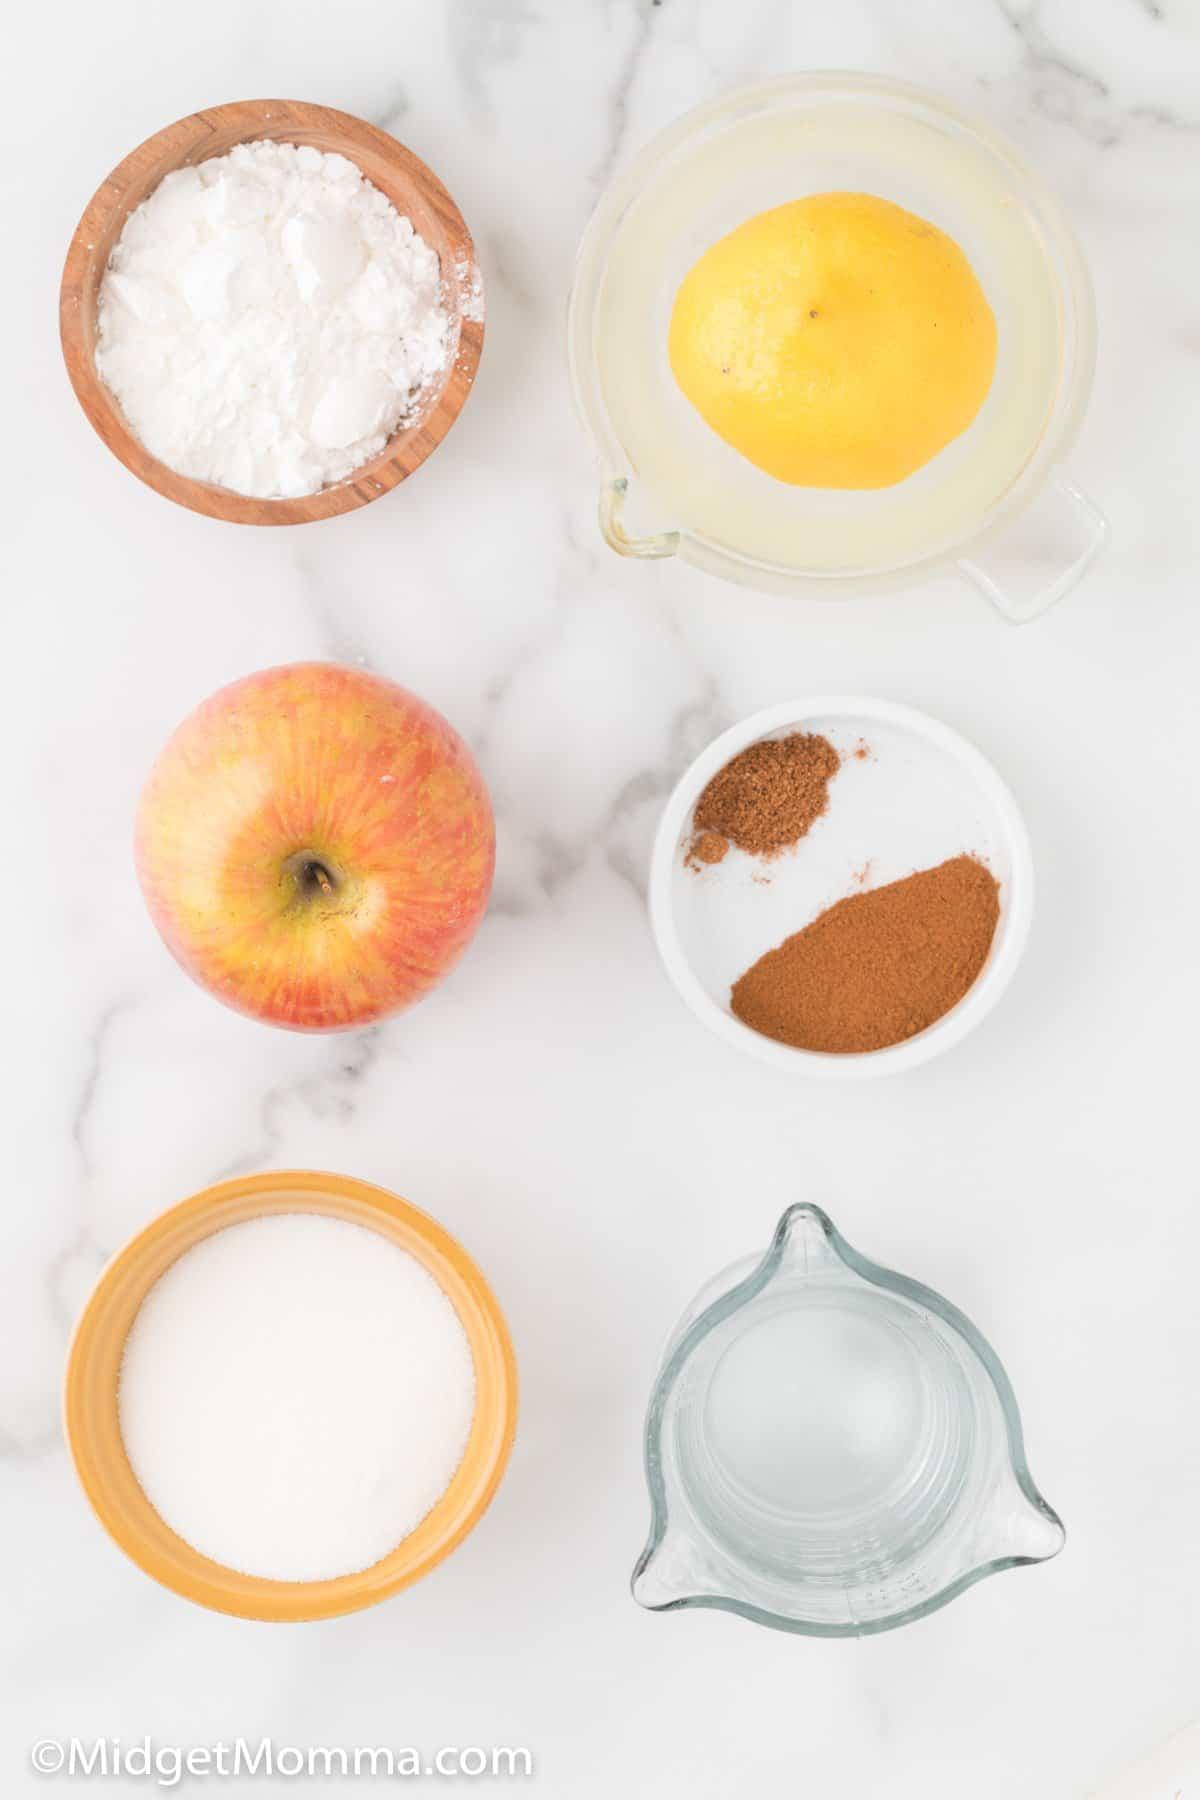 Stove Top Apple Pie Filling ingredients